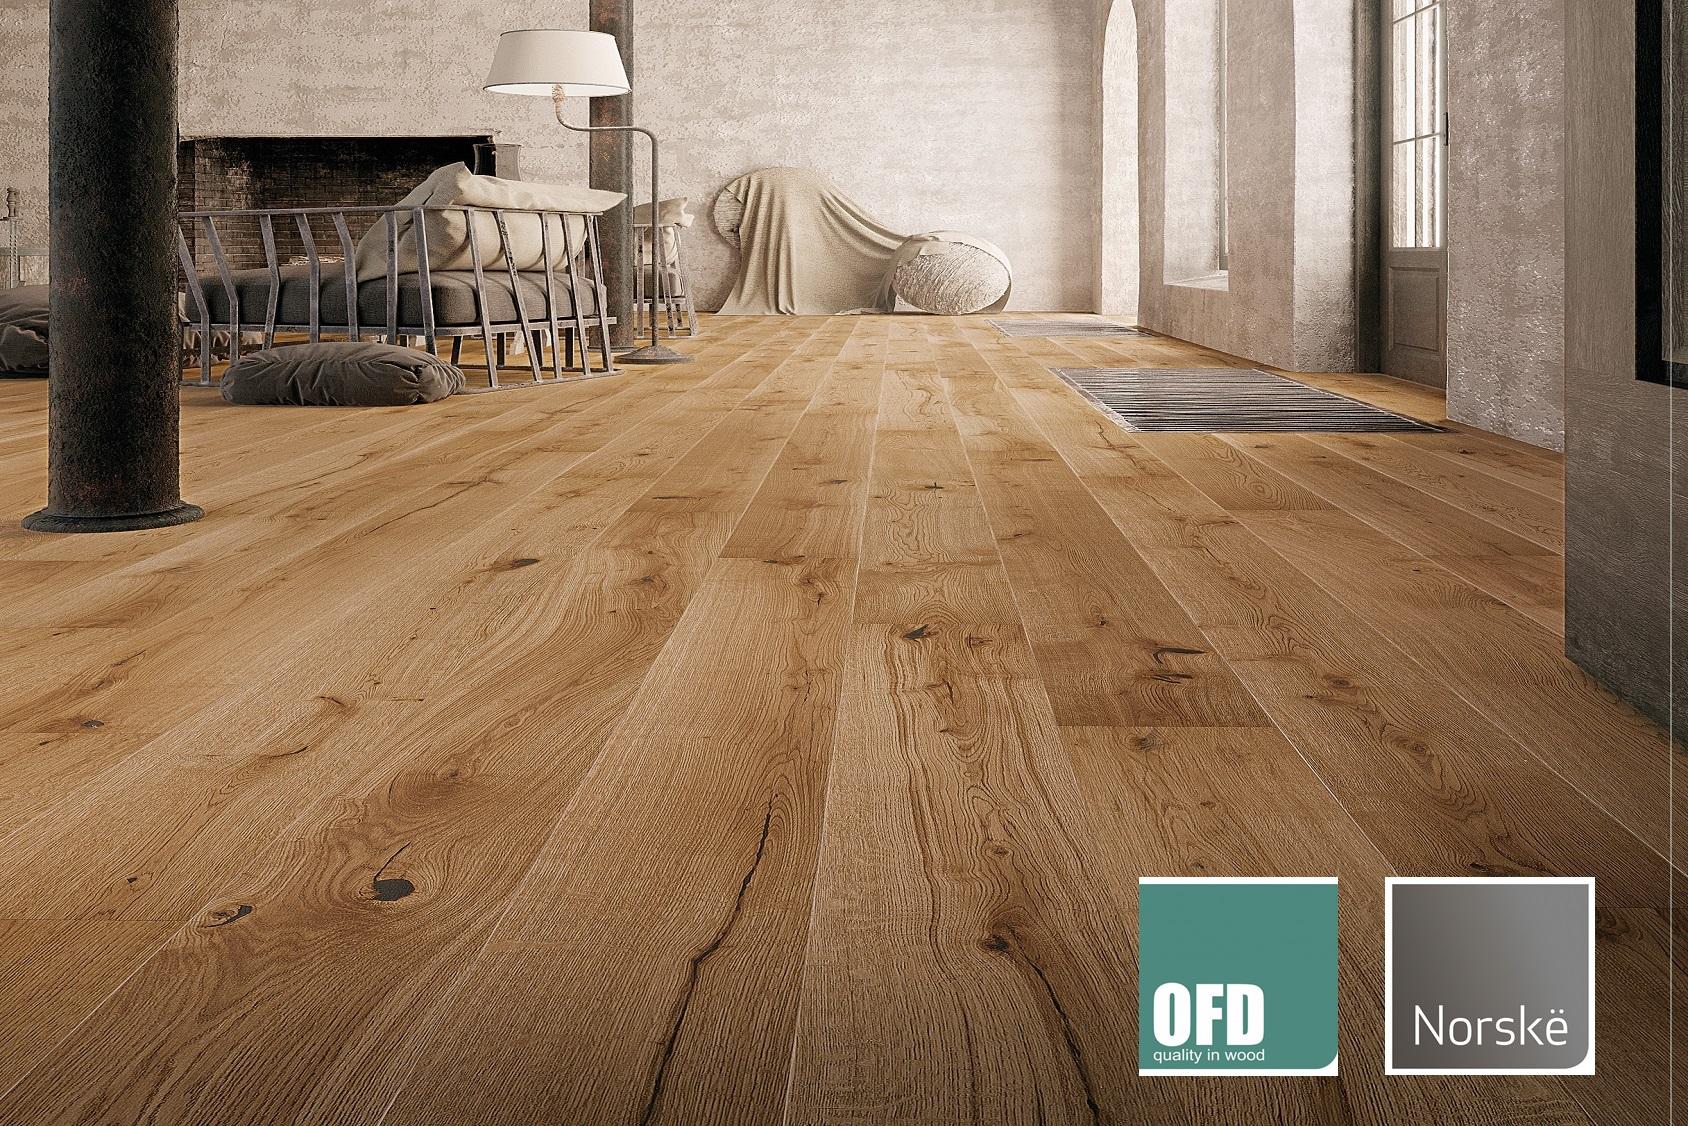 oak flooring direct advice centre. Black Bedroom Furniture Sets. Home Design Ideas